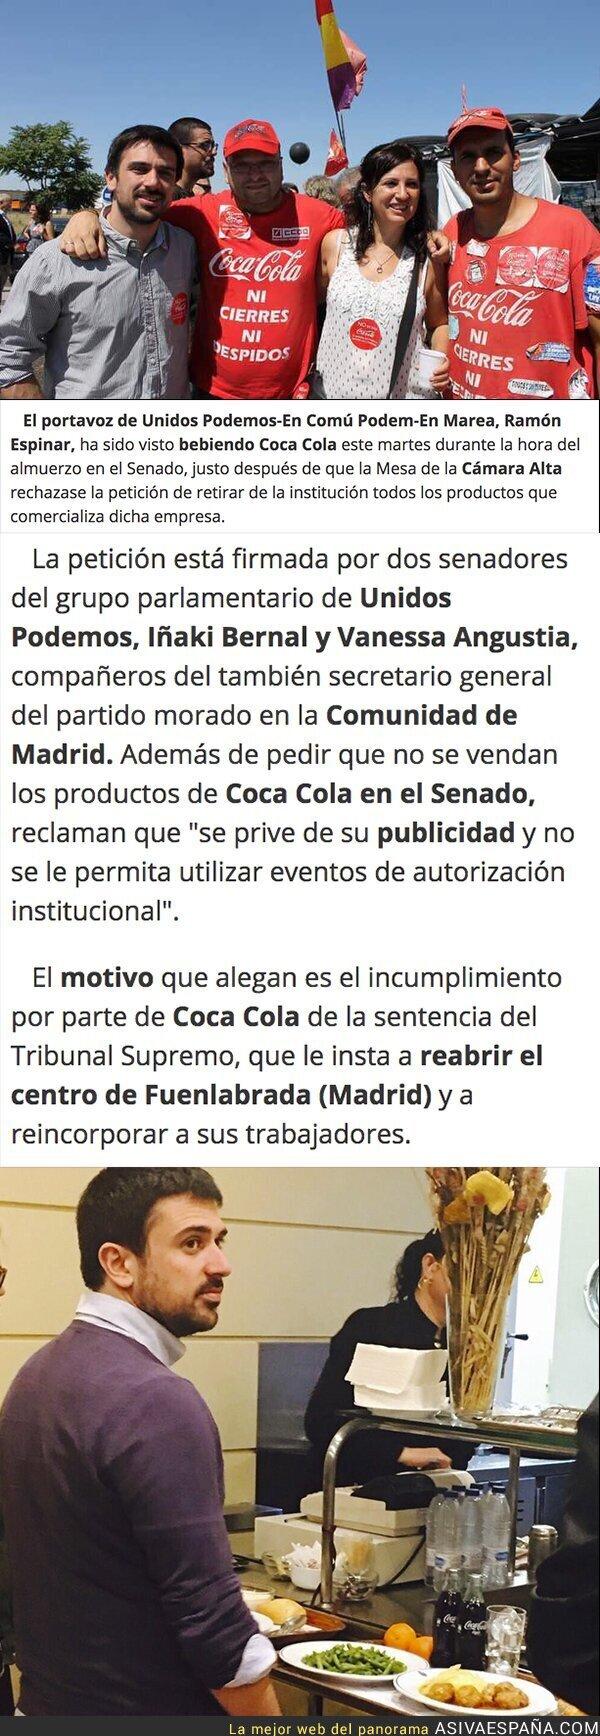 65789 - Pillan a Ramón Espinar (Podemos) consumiendo una Coca-Cola tras pedir que se retiren esas bebidas